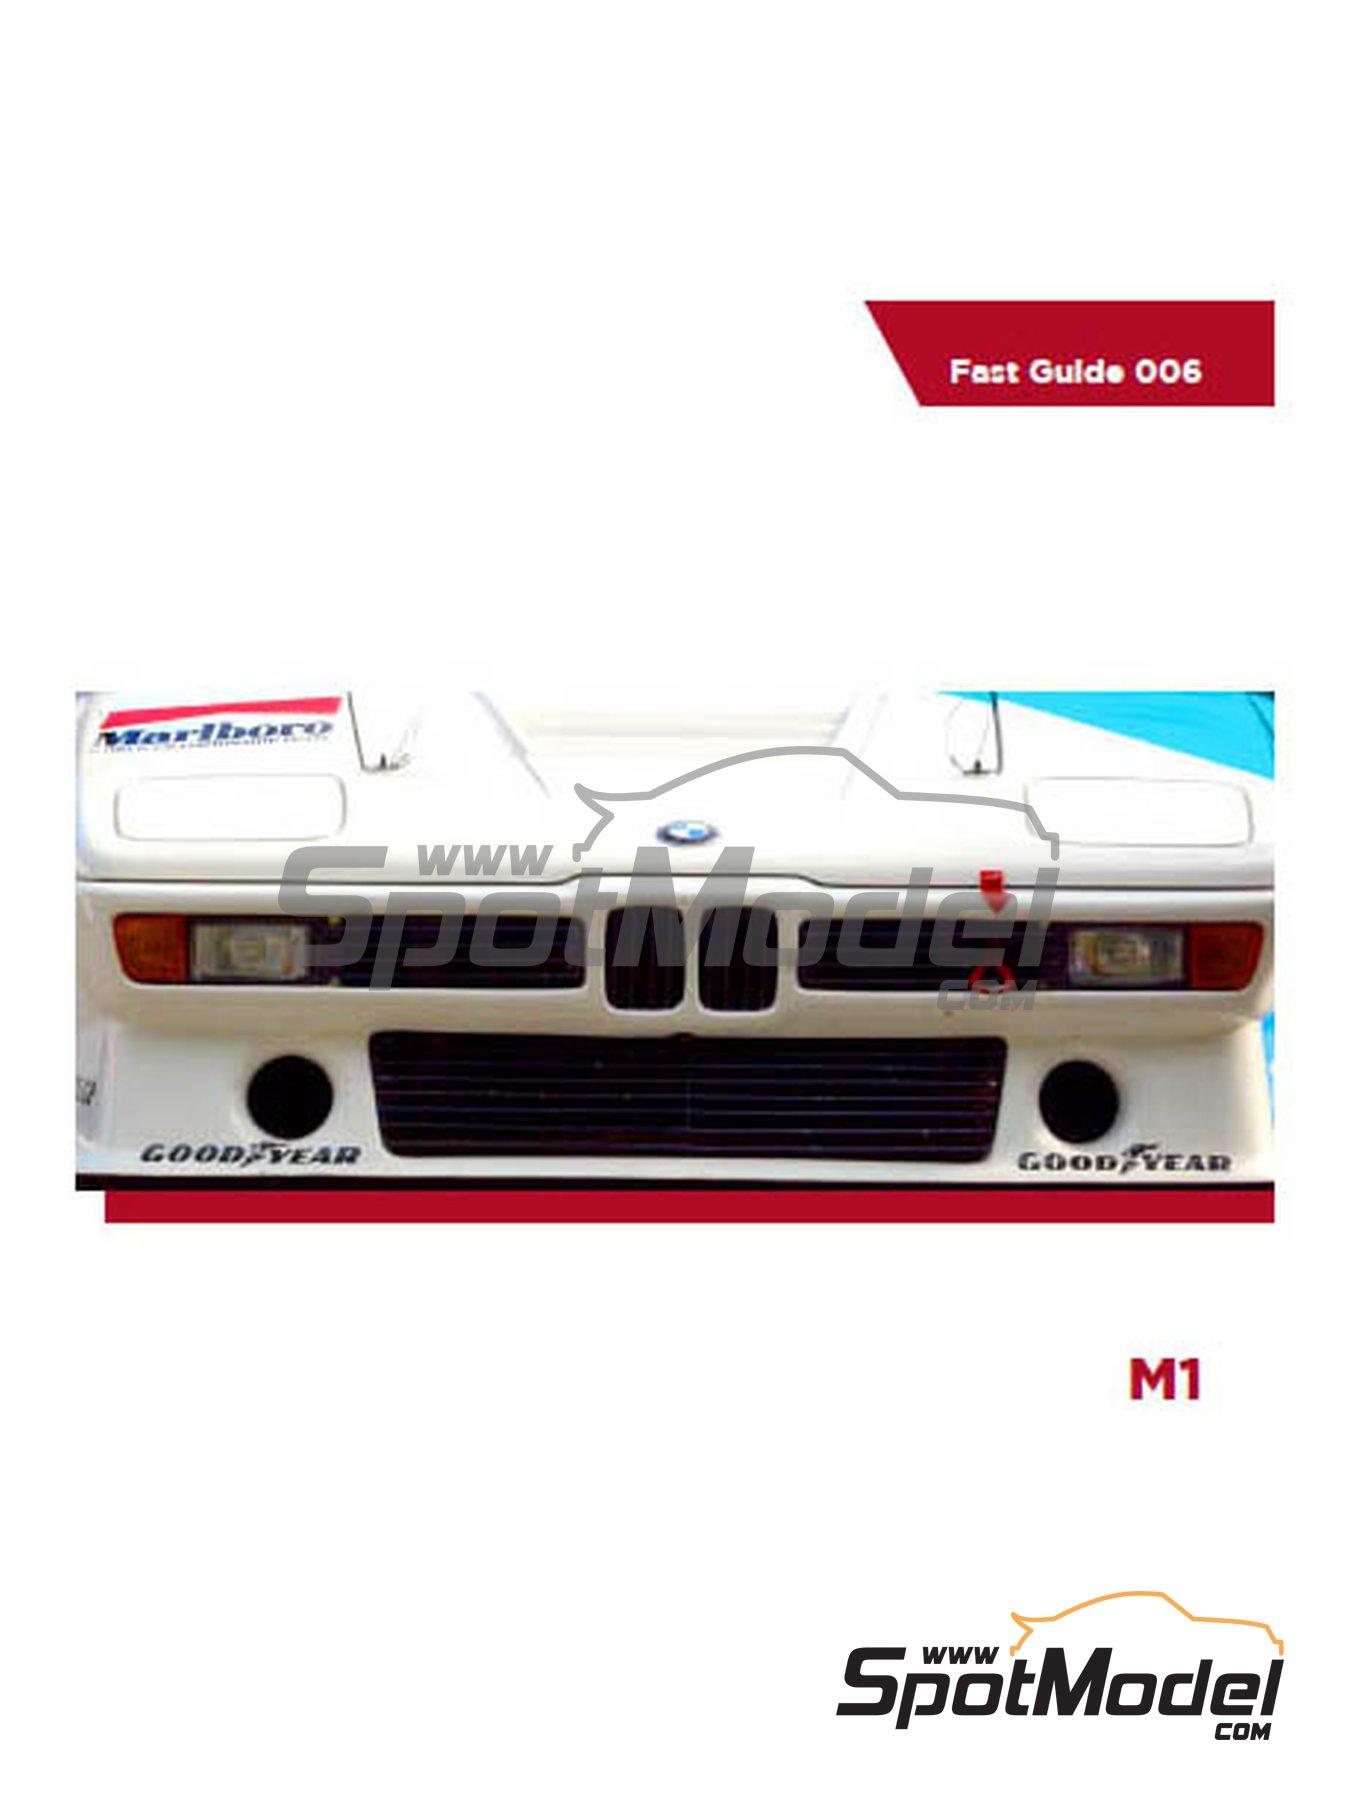 BMW M1 | Reference / walkaround book manufactured by Komakai (ref.KOM-FG006) image